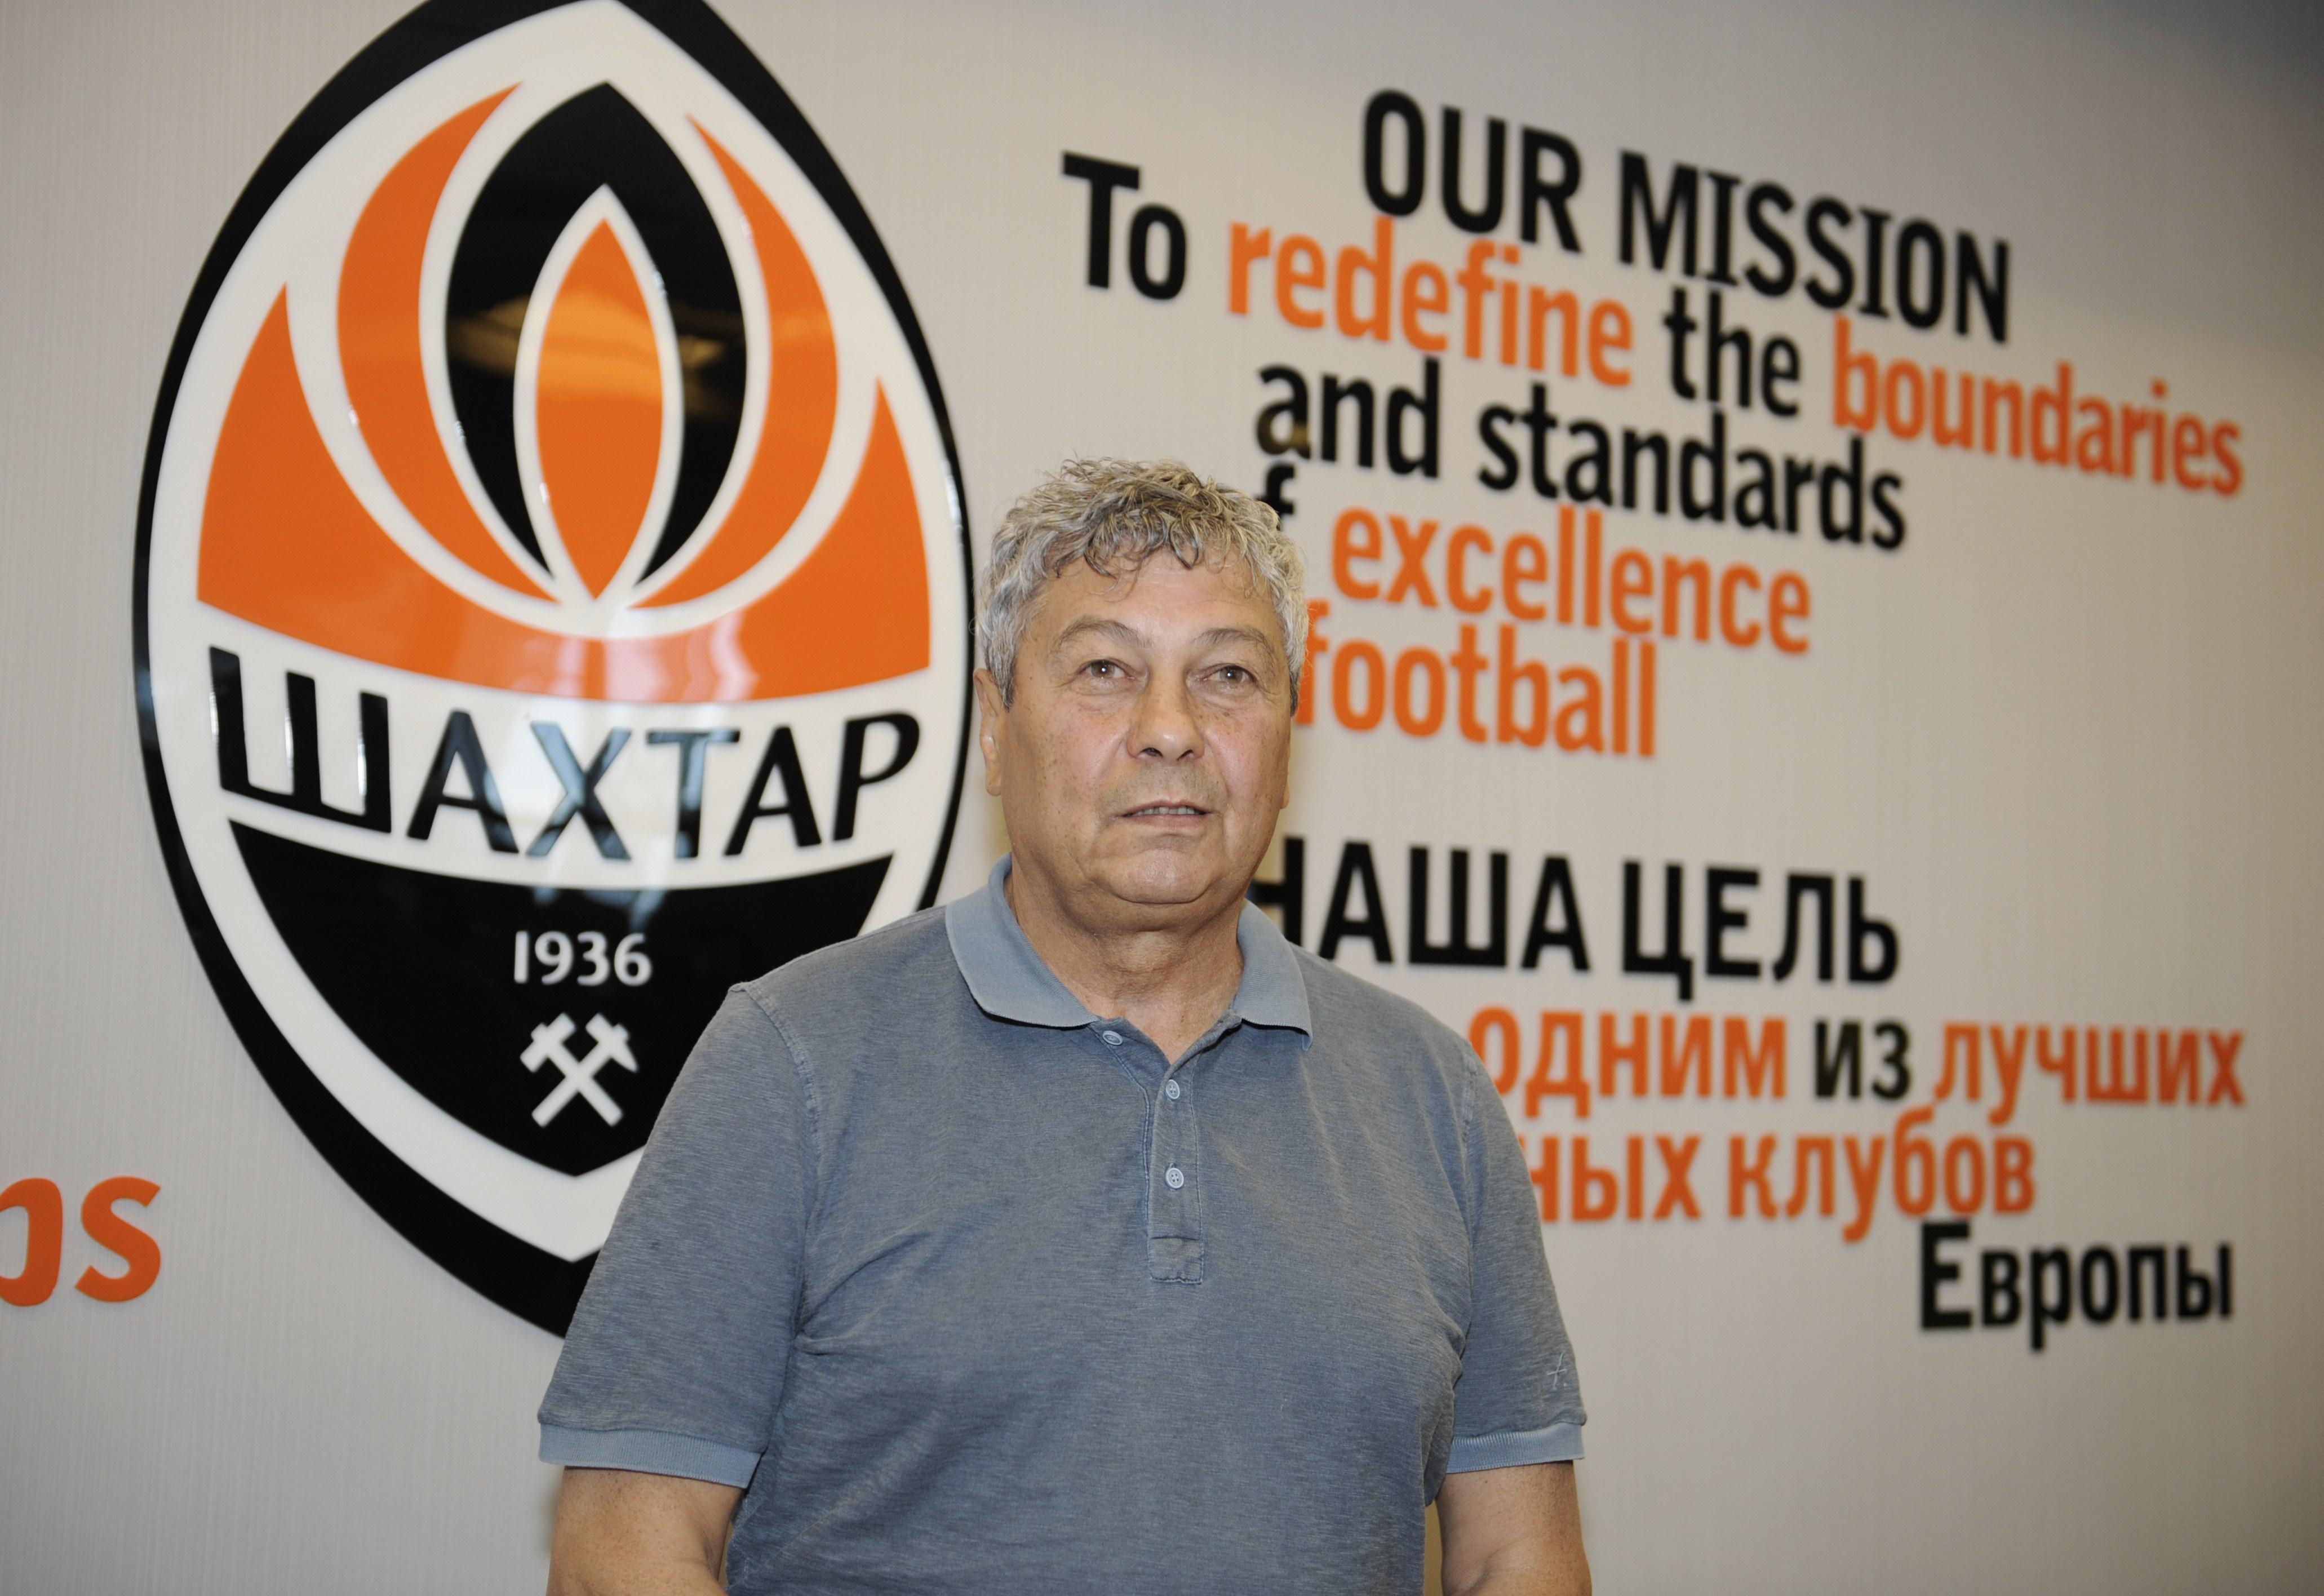 Mircea Lucescu Shakhtar Donetsk